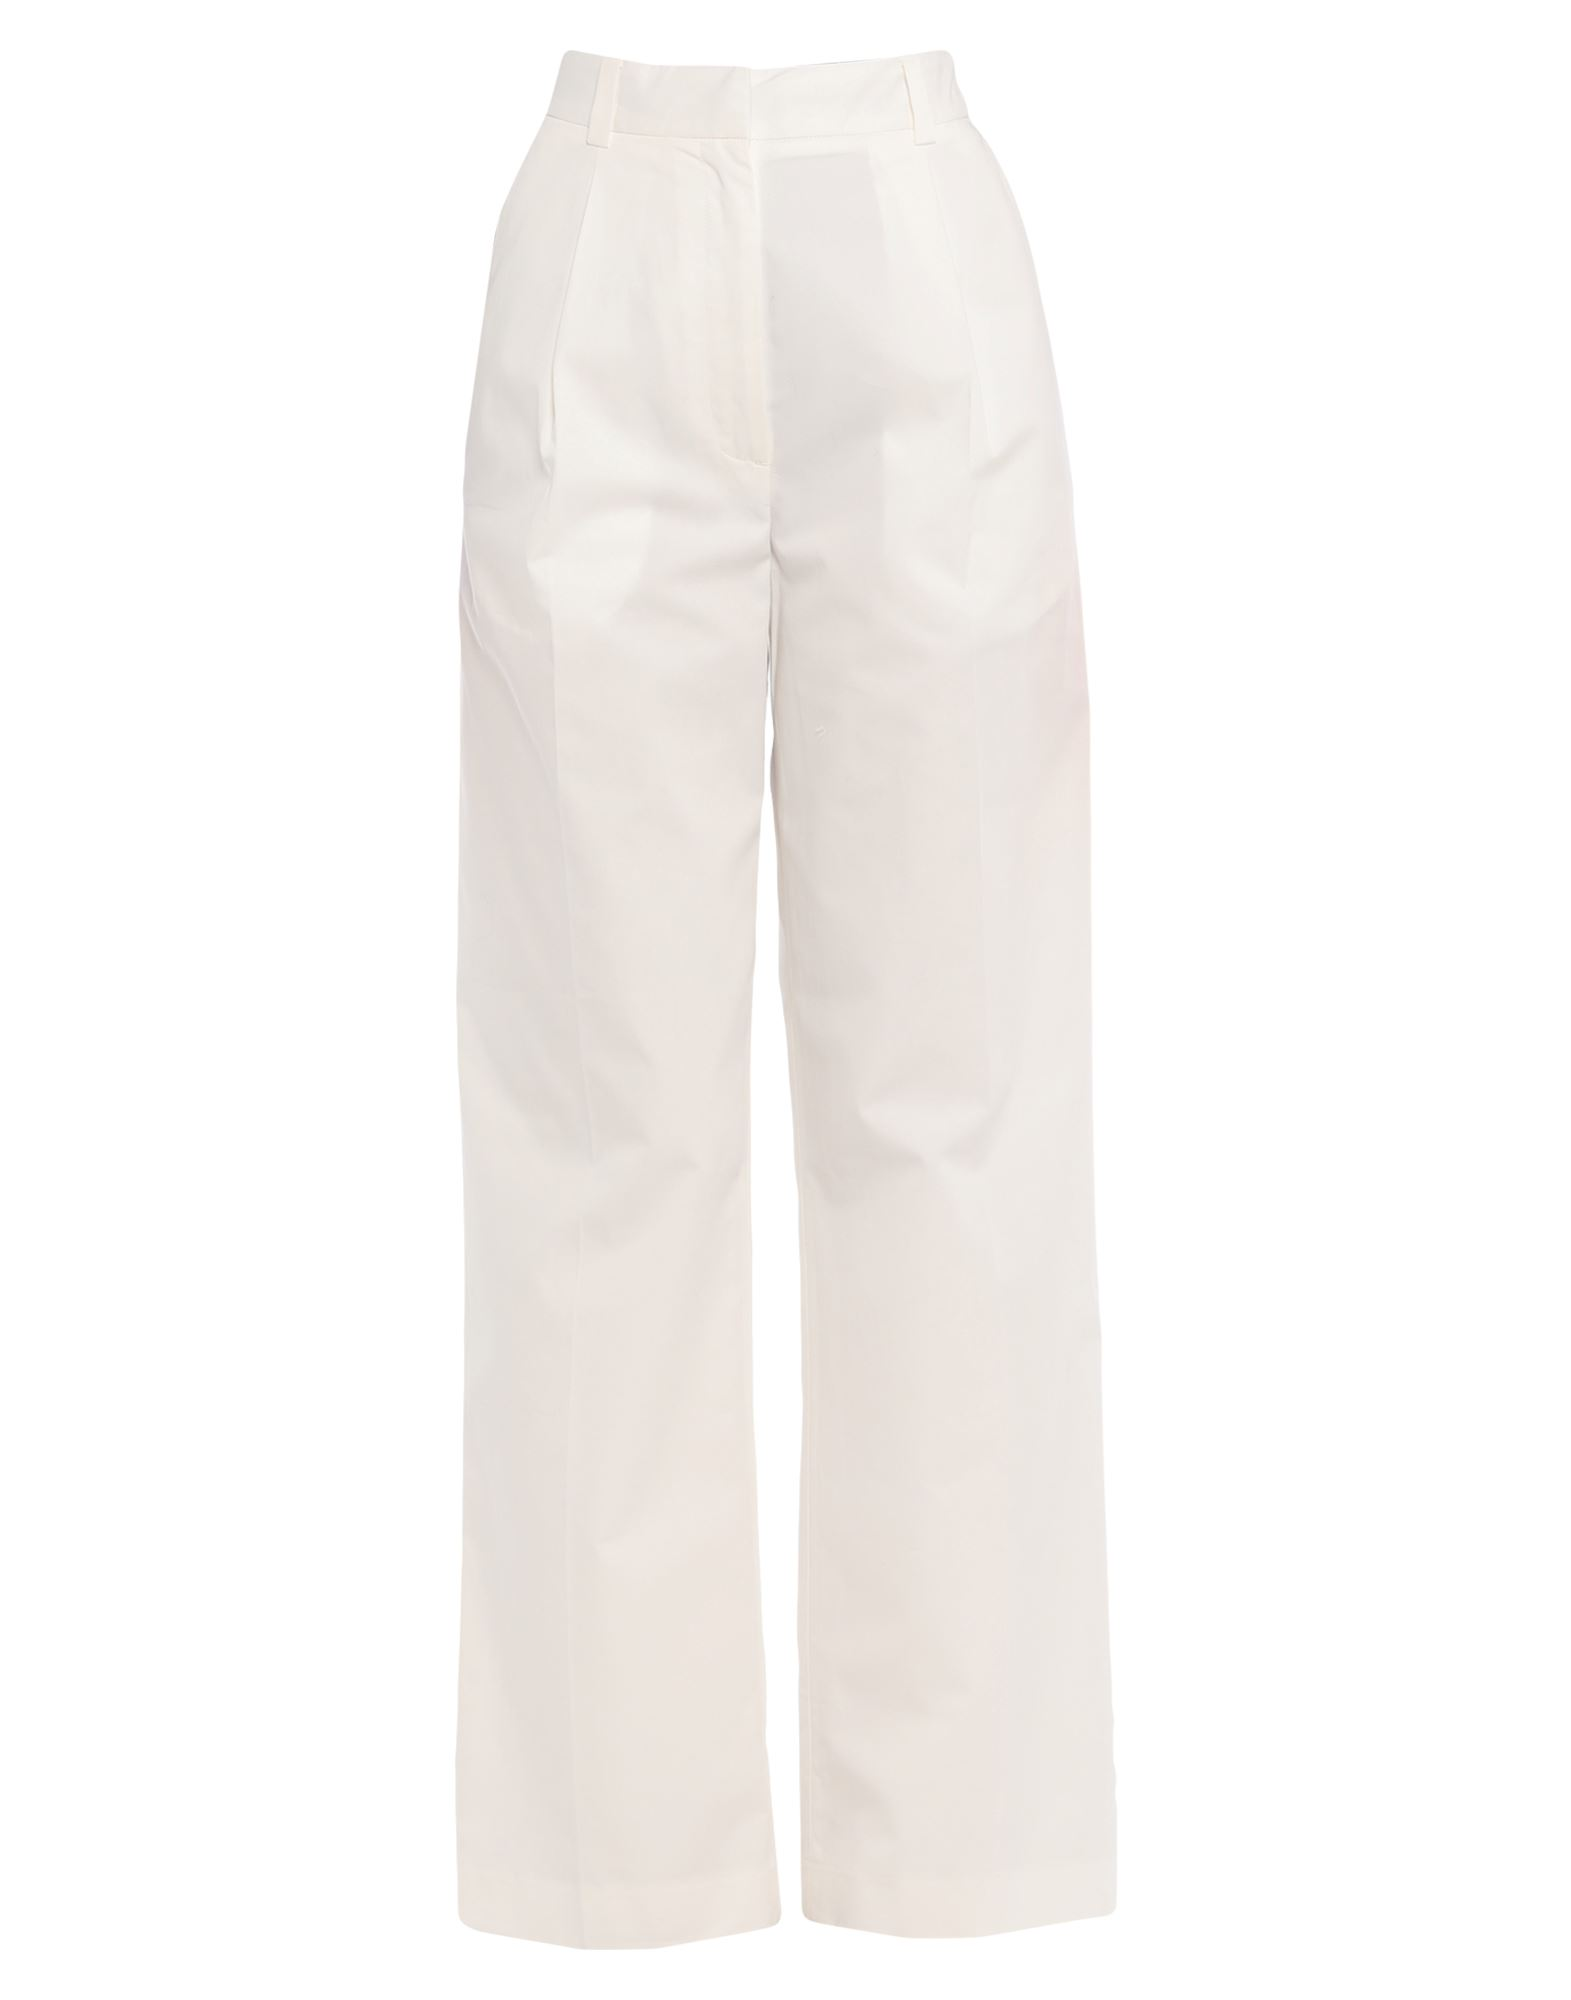 LES COYOTES DE PARIS Повседневные брюки